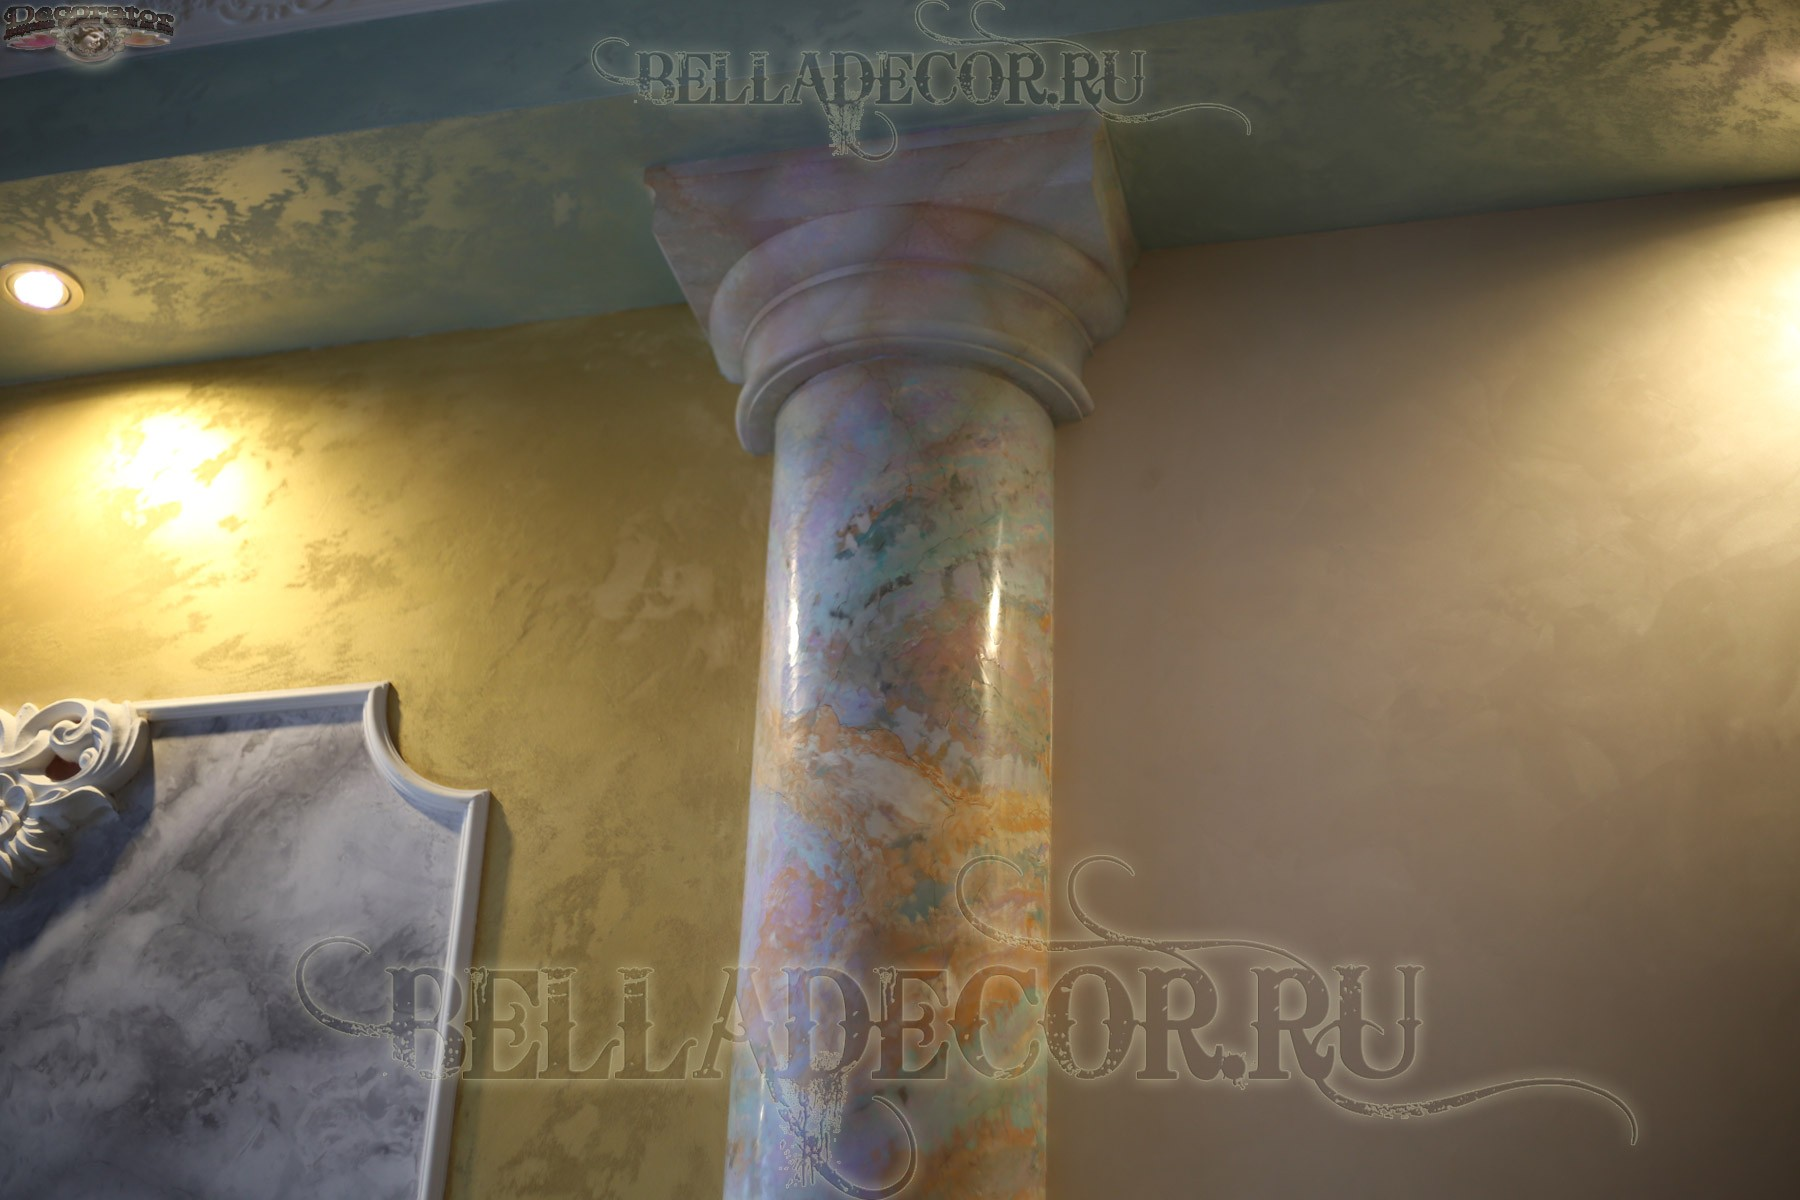 Creama Bianco Stucco Veneziano - материал венецианская штукатурка